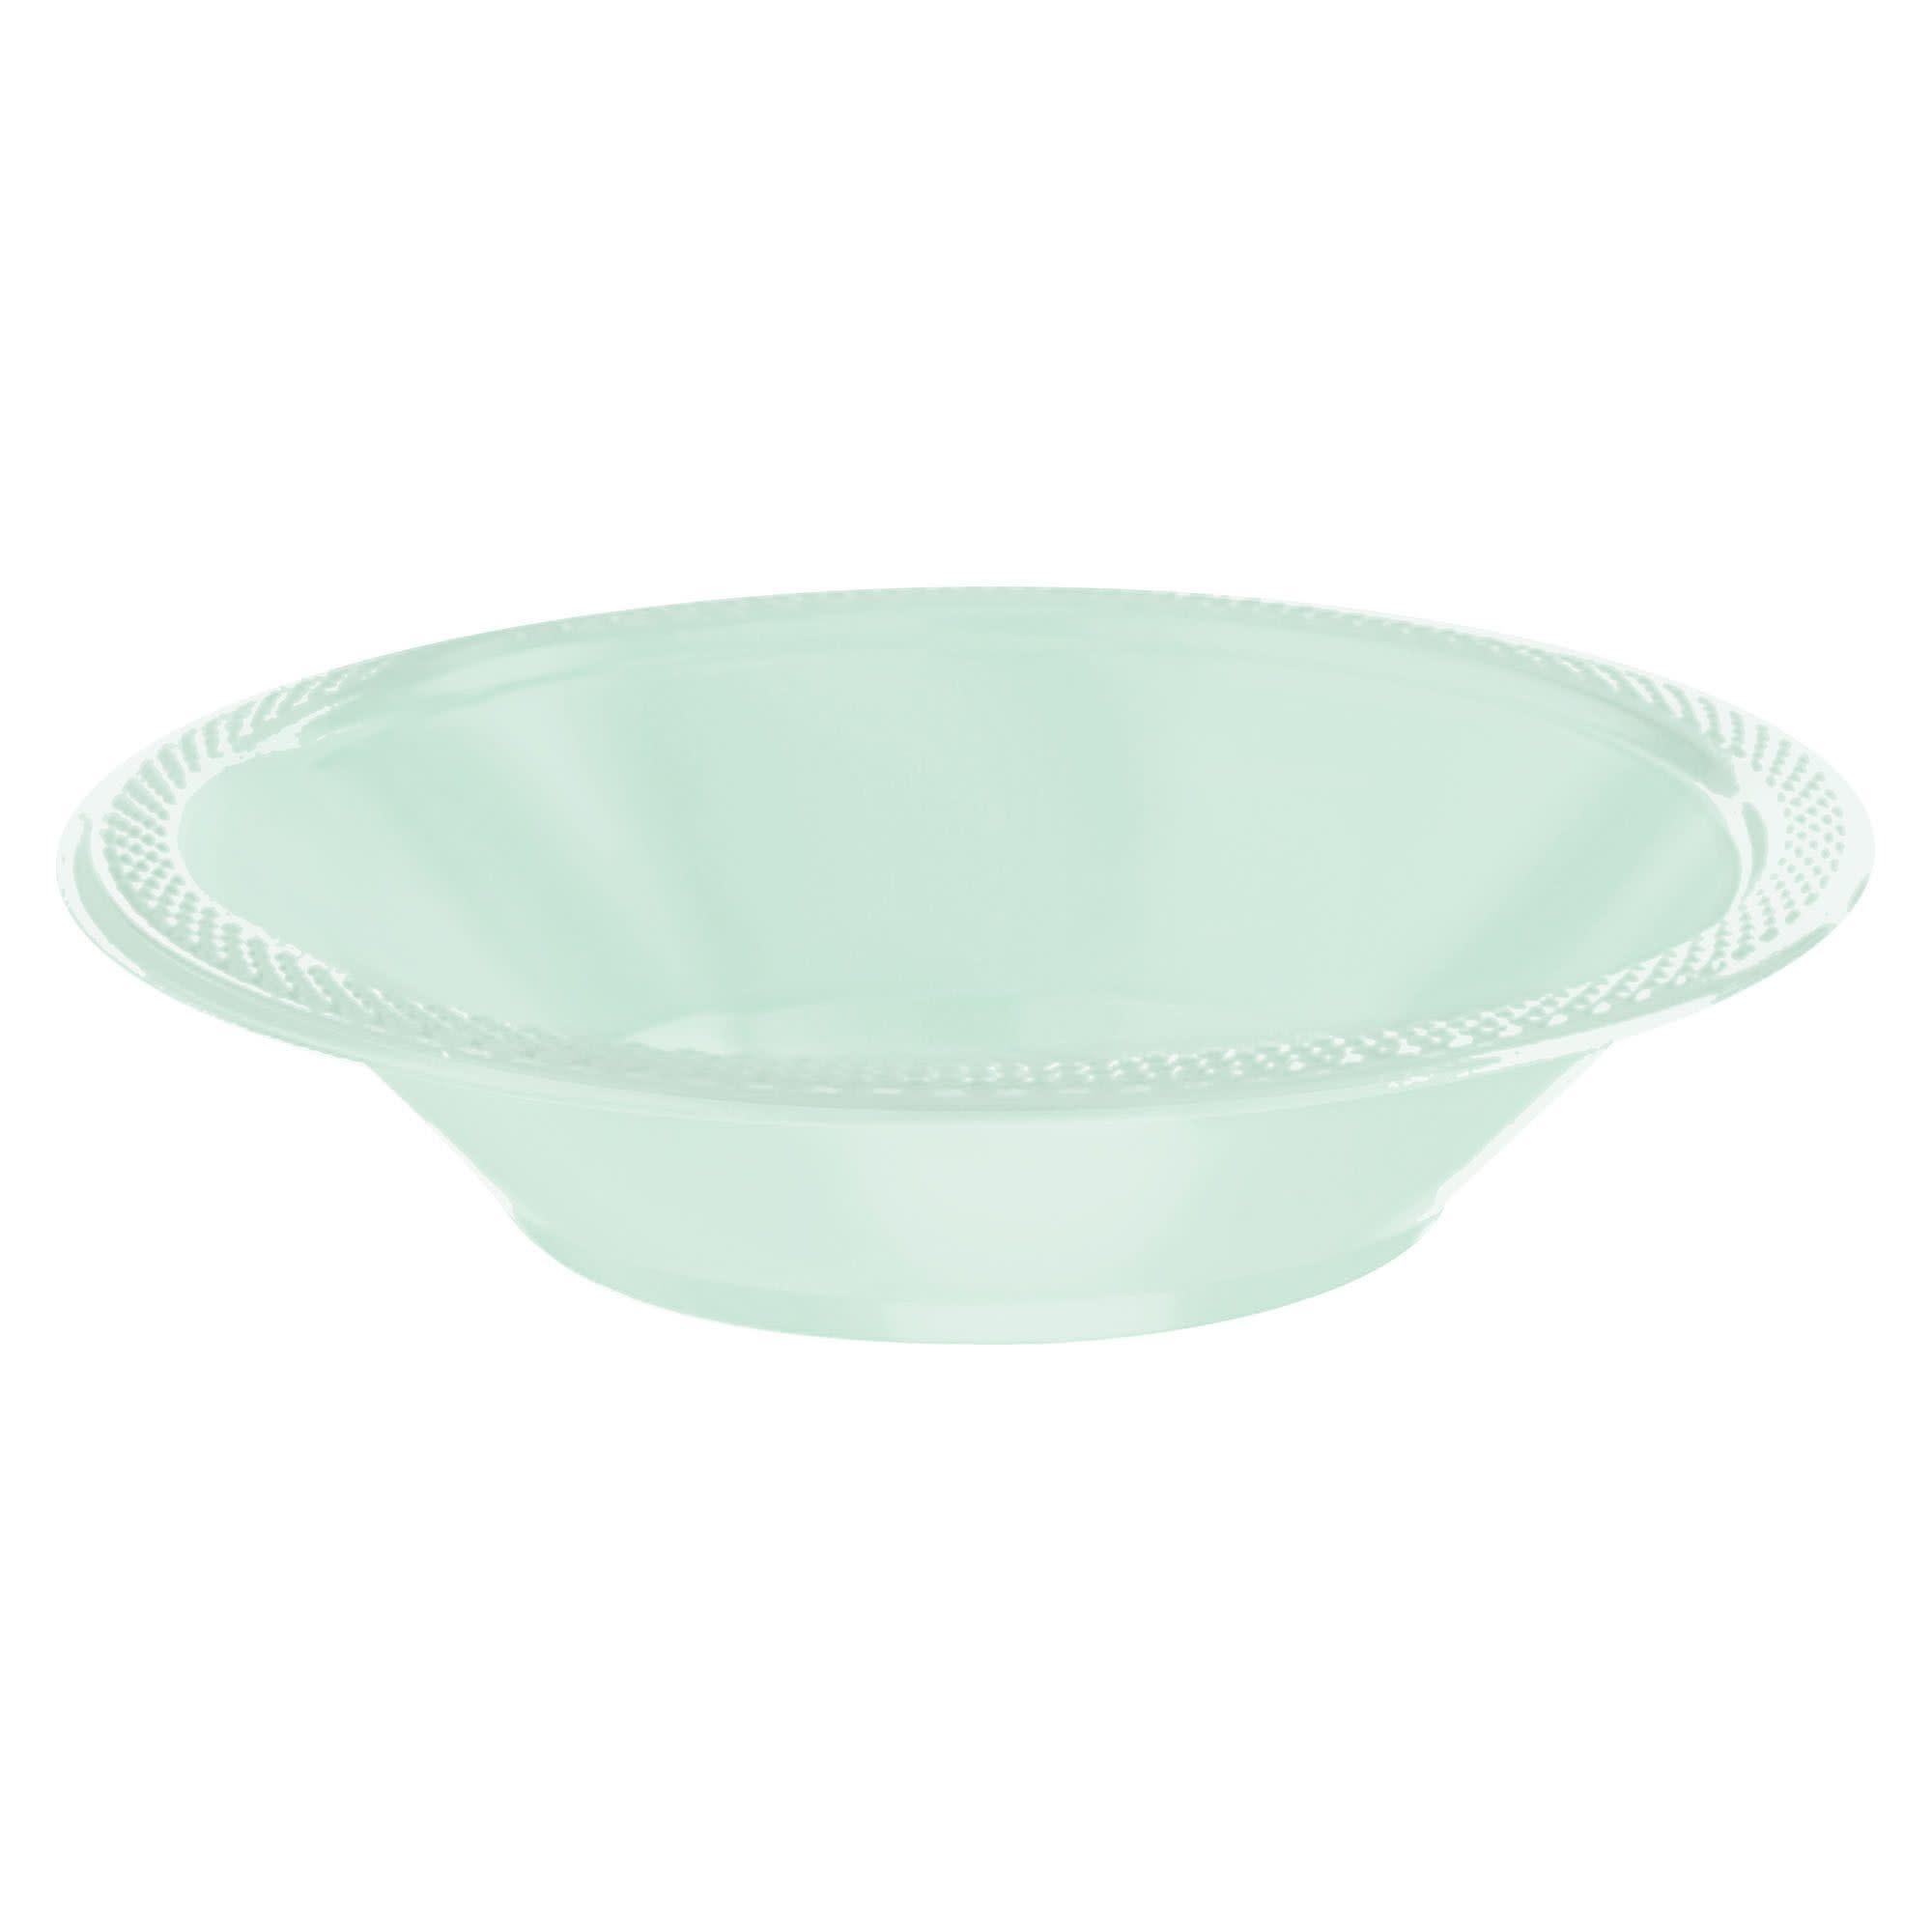 Cool Mint Plastic Bowls, 12 Oz.